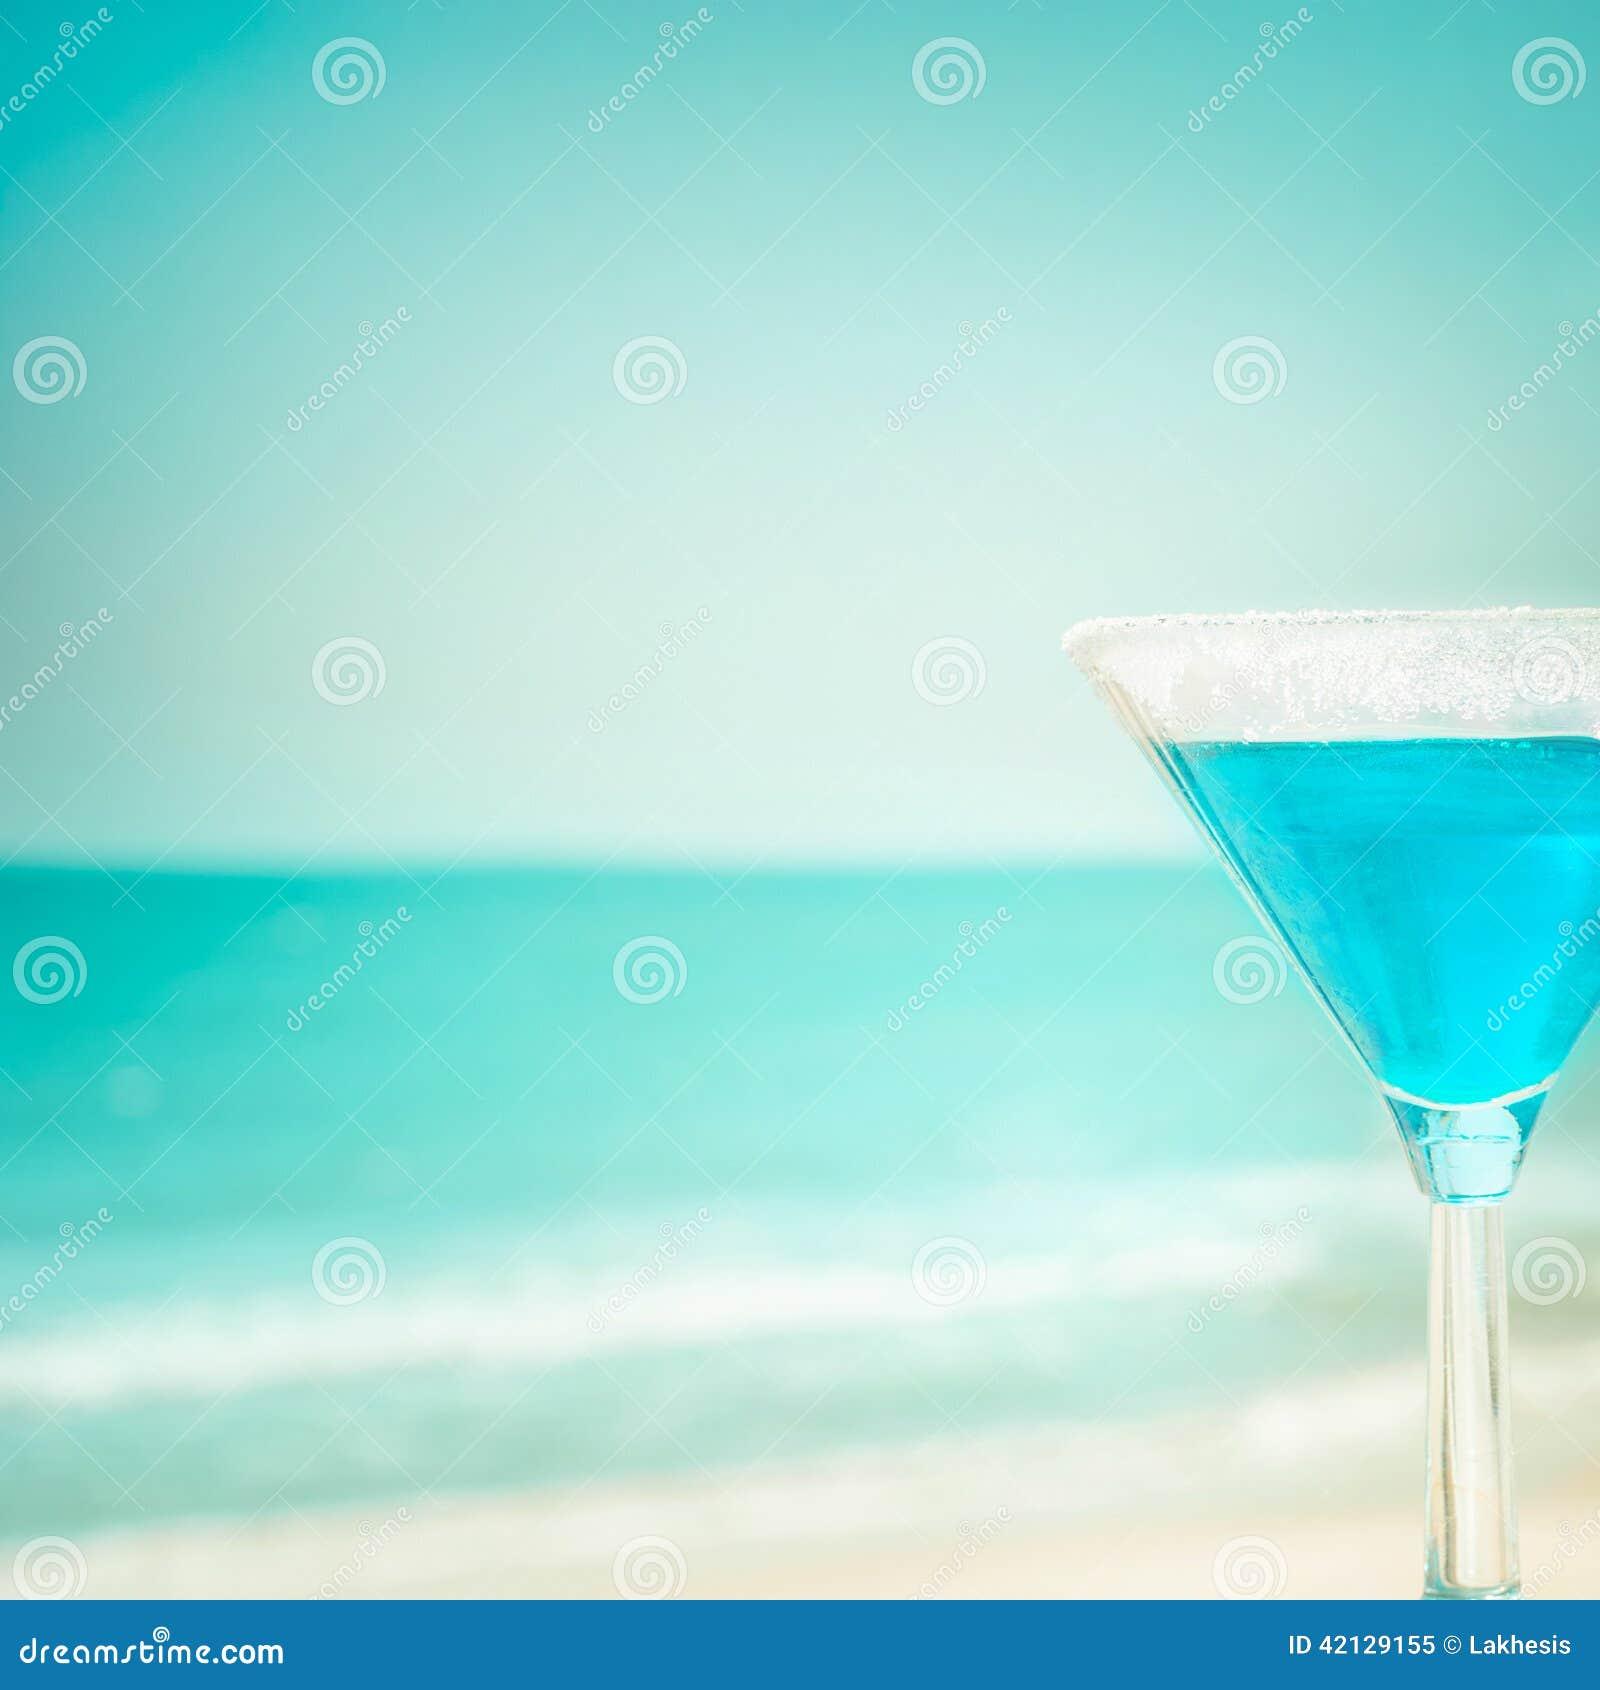 Blue Margarita Cocktail At Tropical Ocean Beach Stock ...